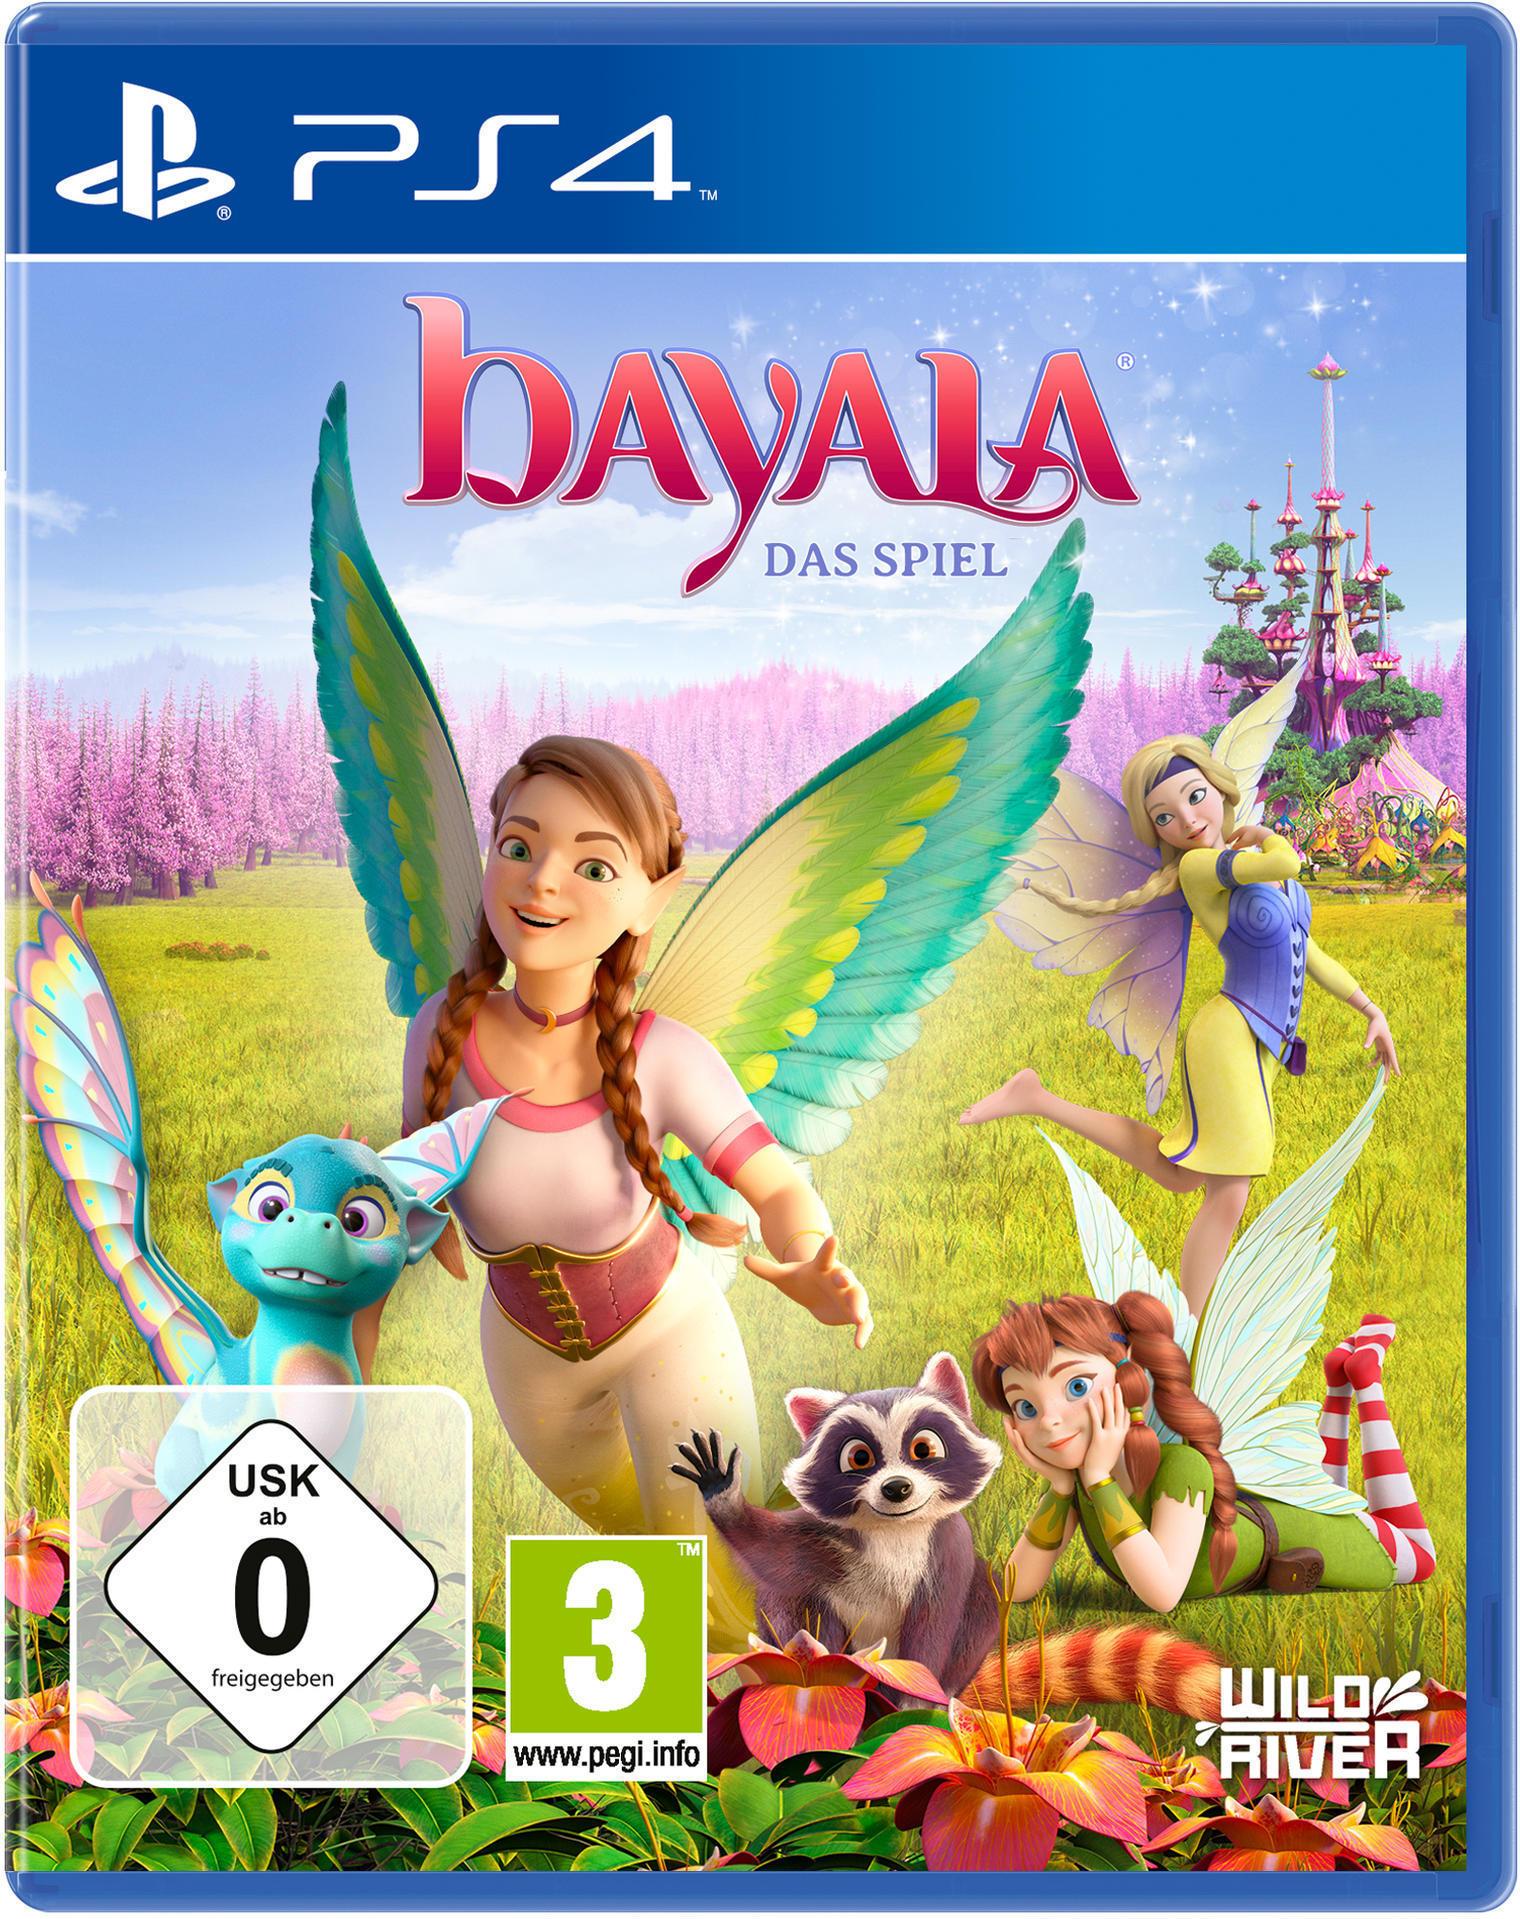 Bayala The Game (PlayStation 4) für 34,99 Euro